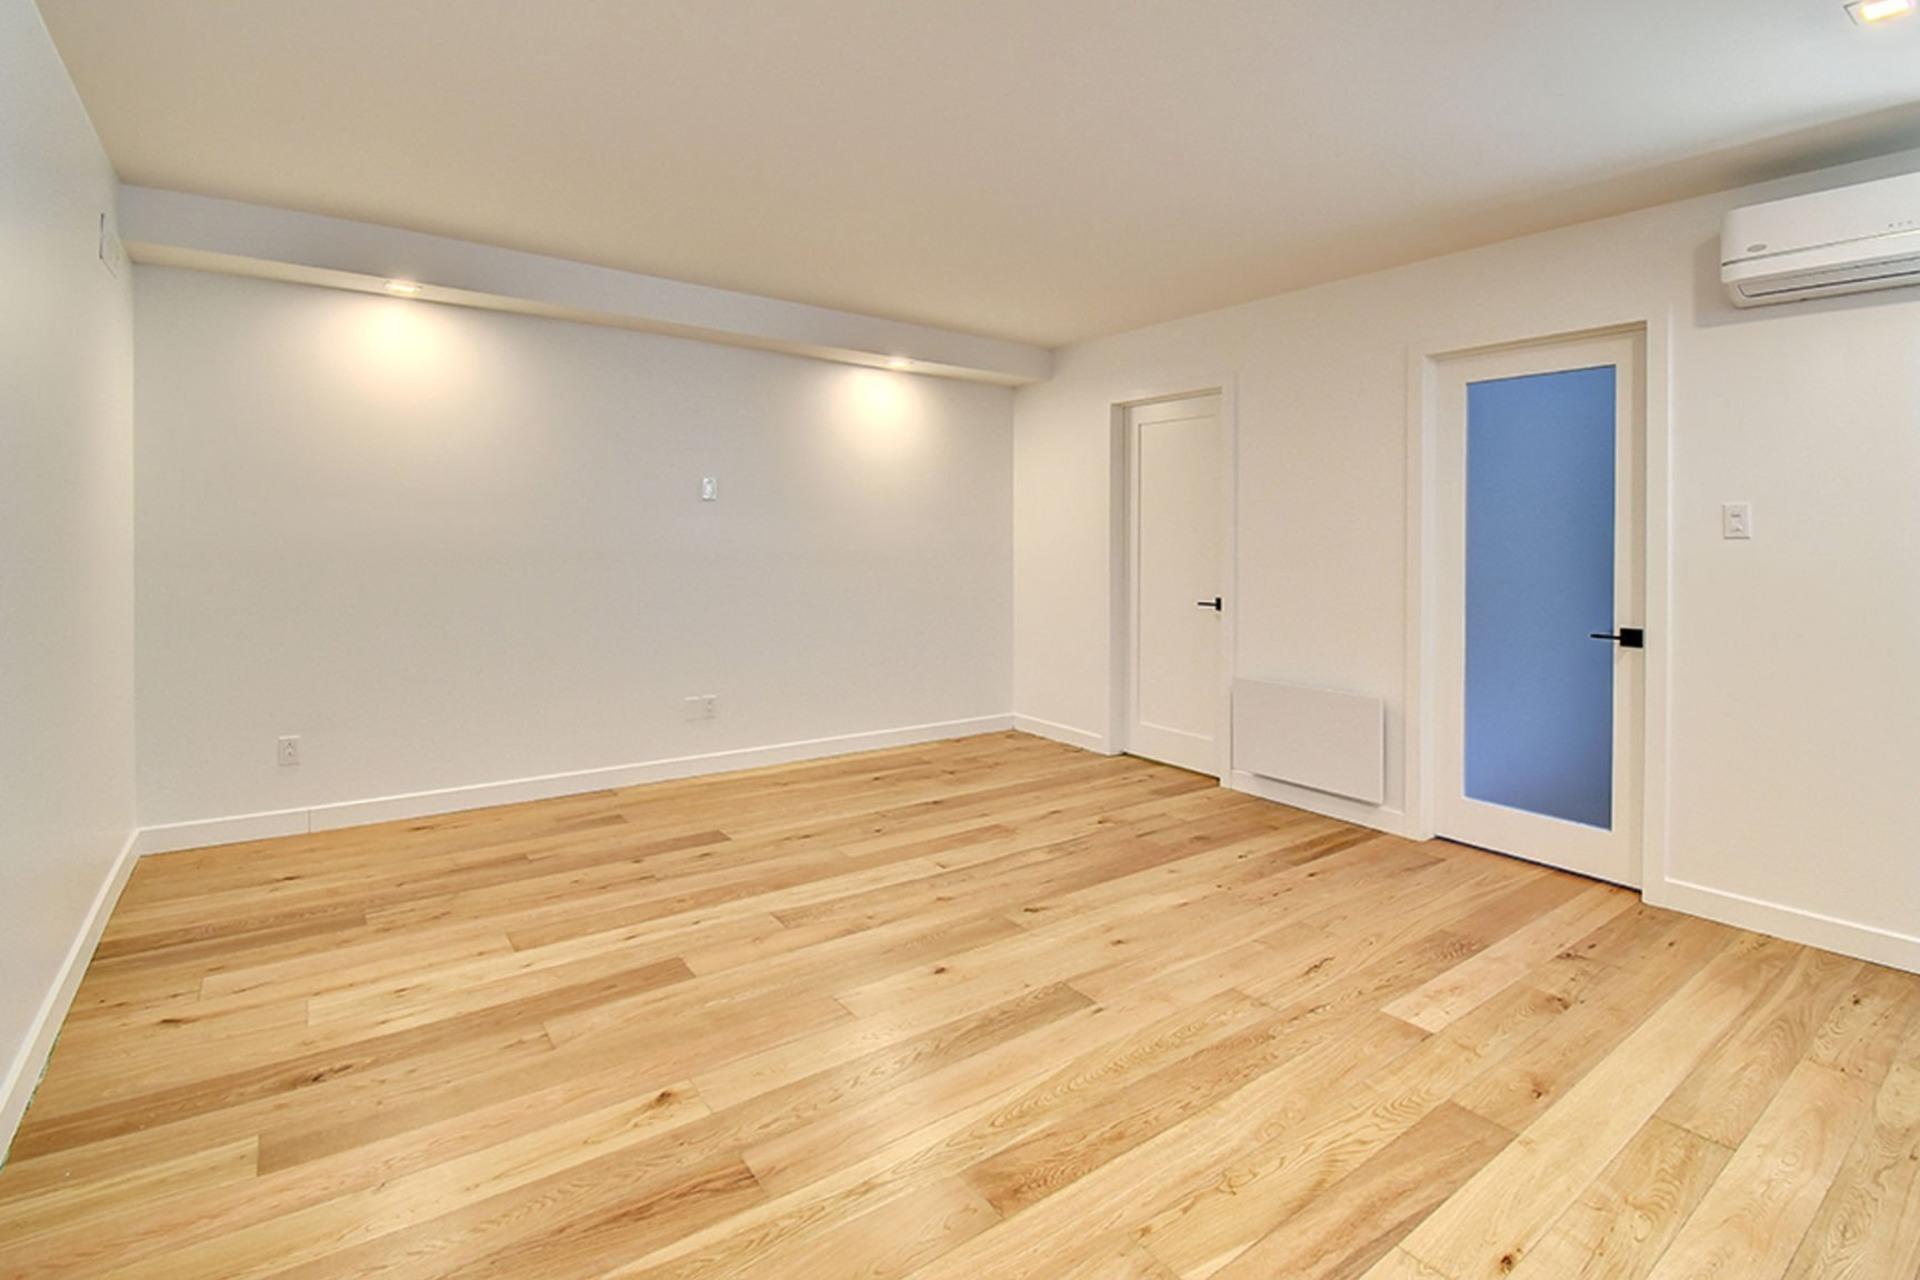 image 18 - Apartment For sale Le Vieux-Longueuil Longueuil  - 9 rooms